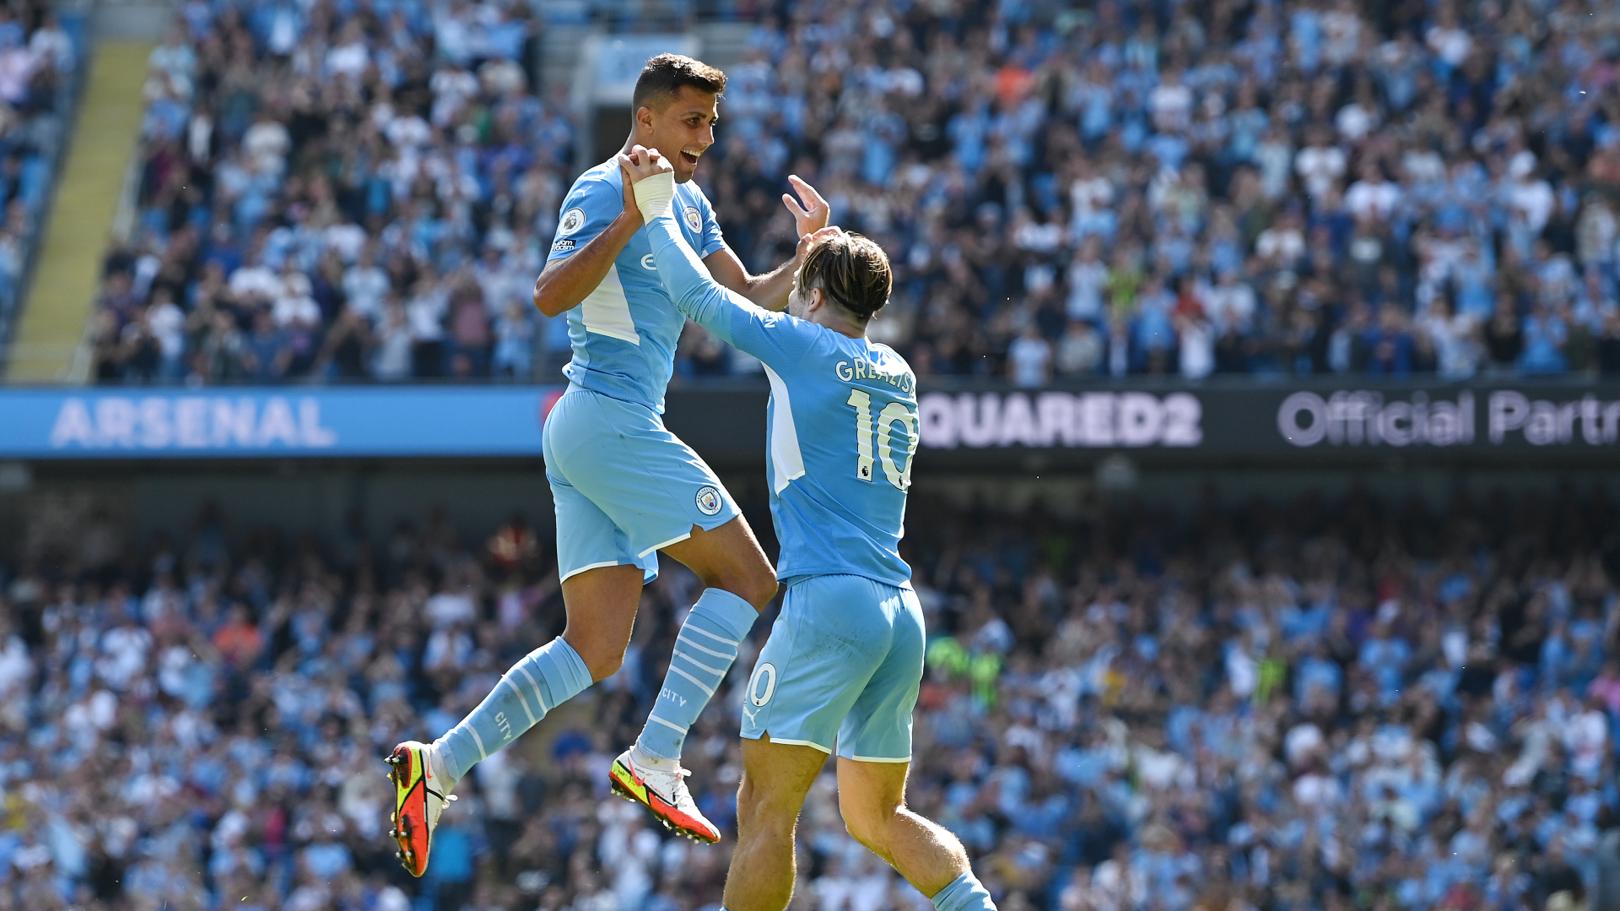 Leicester - City: hora y TV